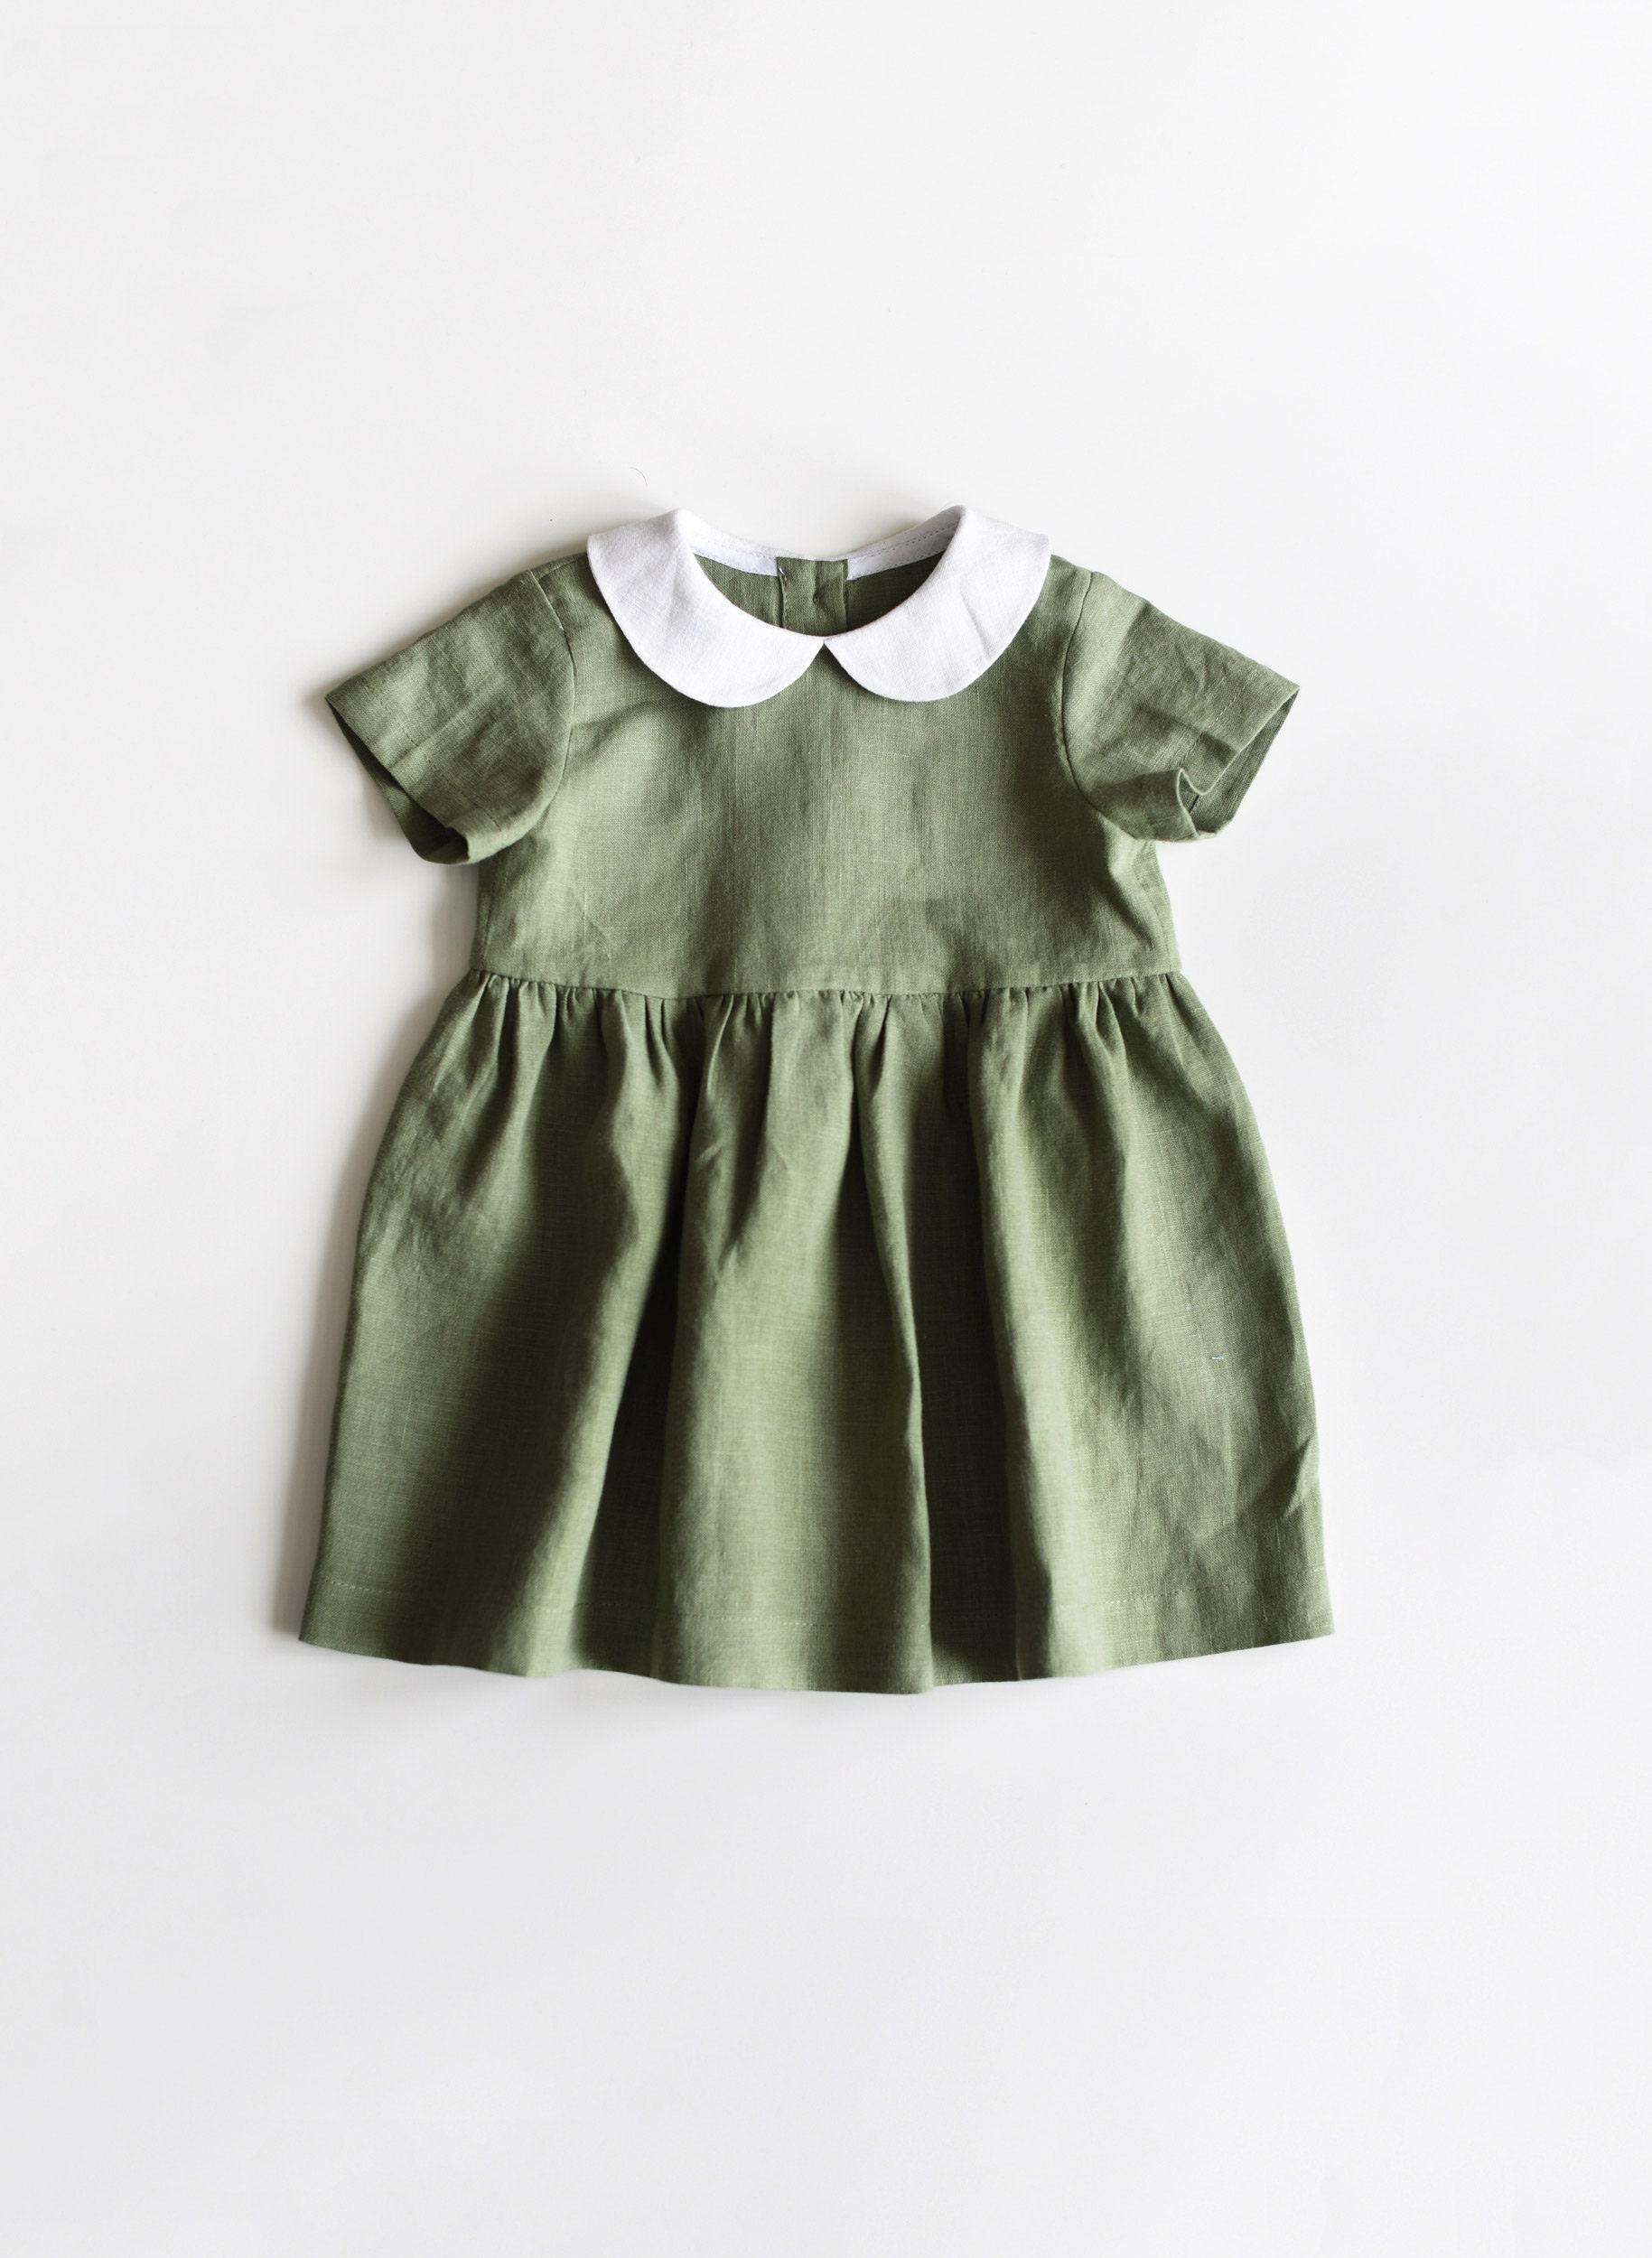 b685f9450545 Linen Dress Baby Dress Linen Baby Dress Toddler Dress Sage   Etsy